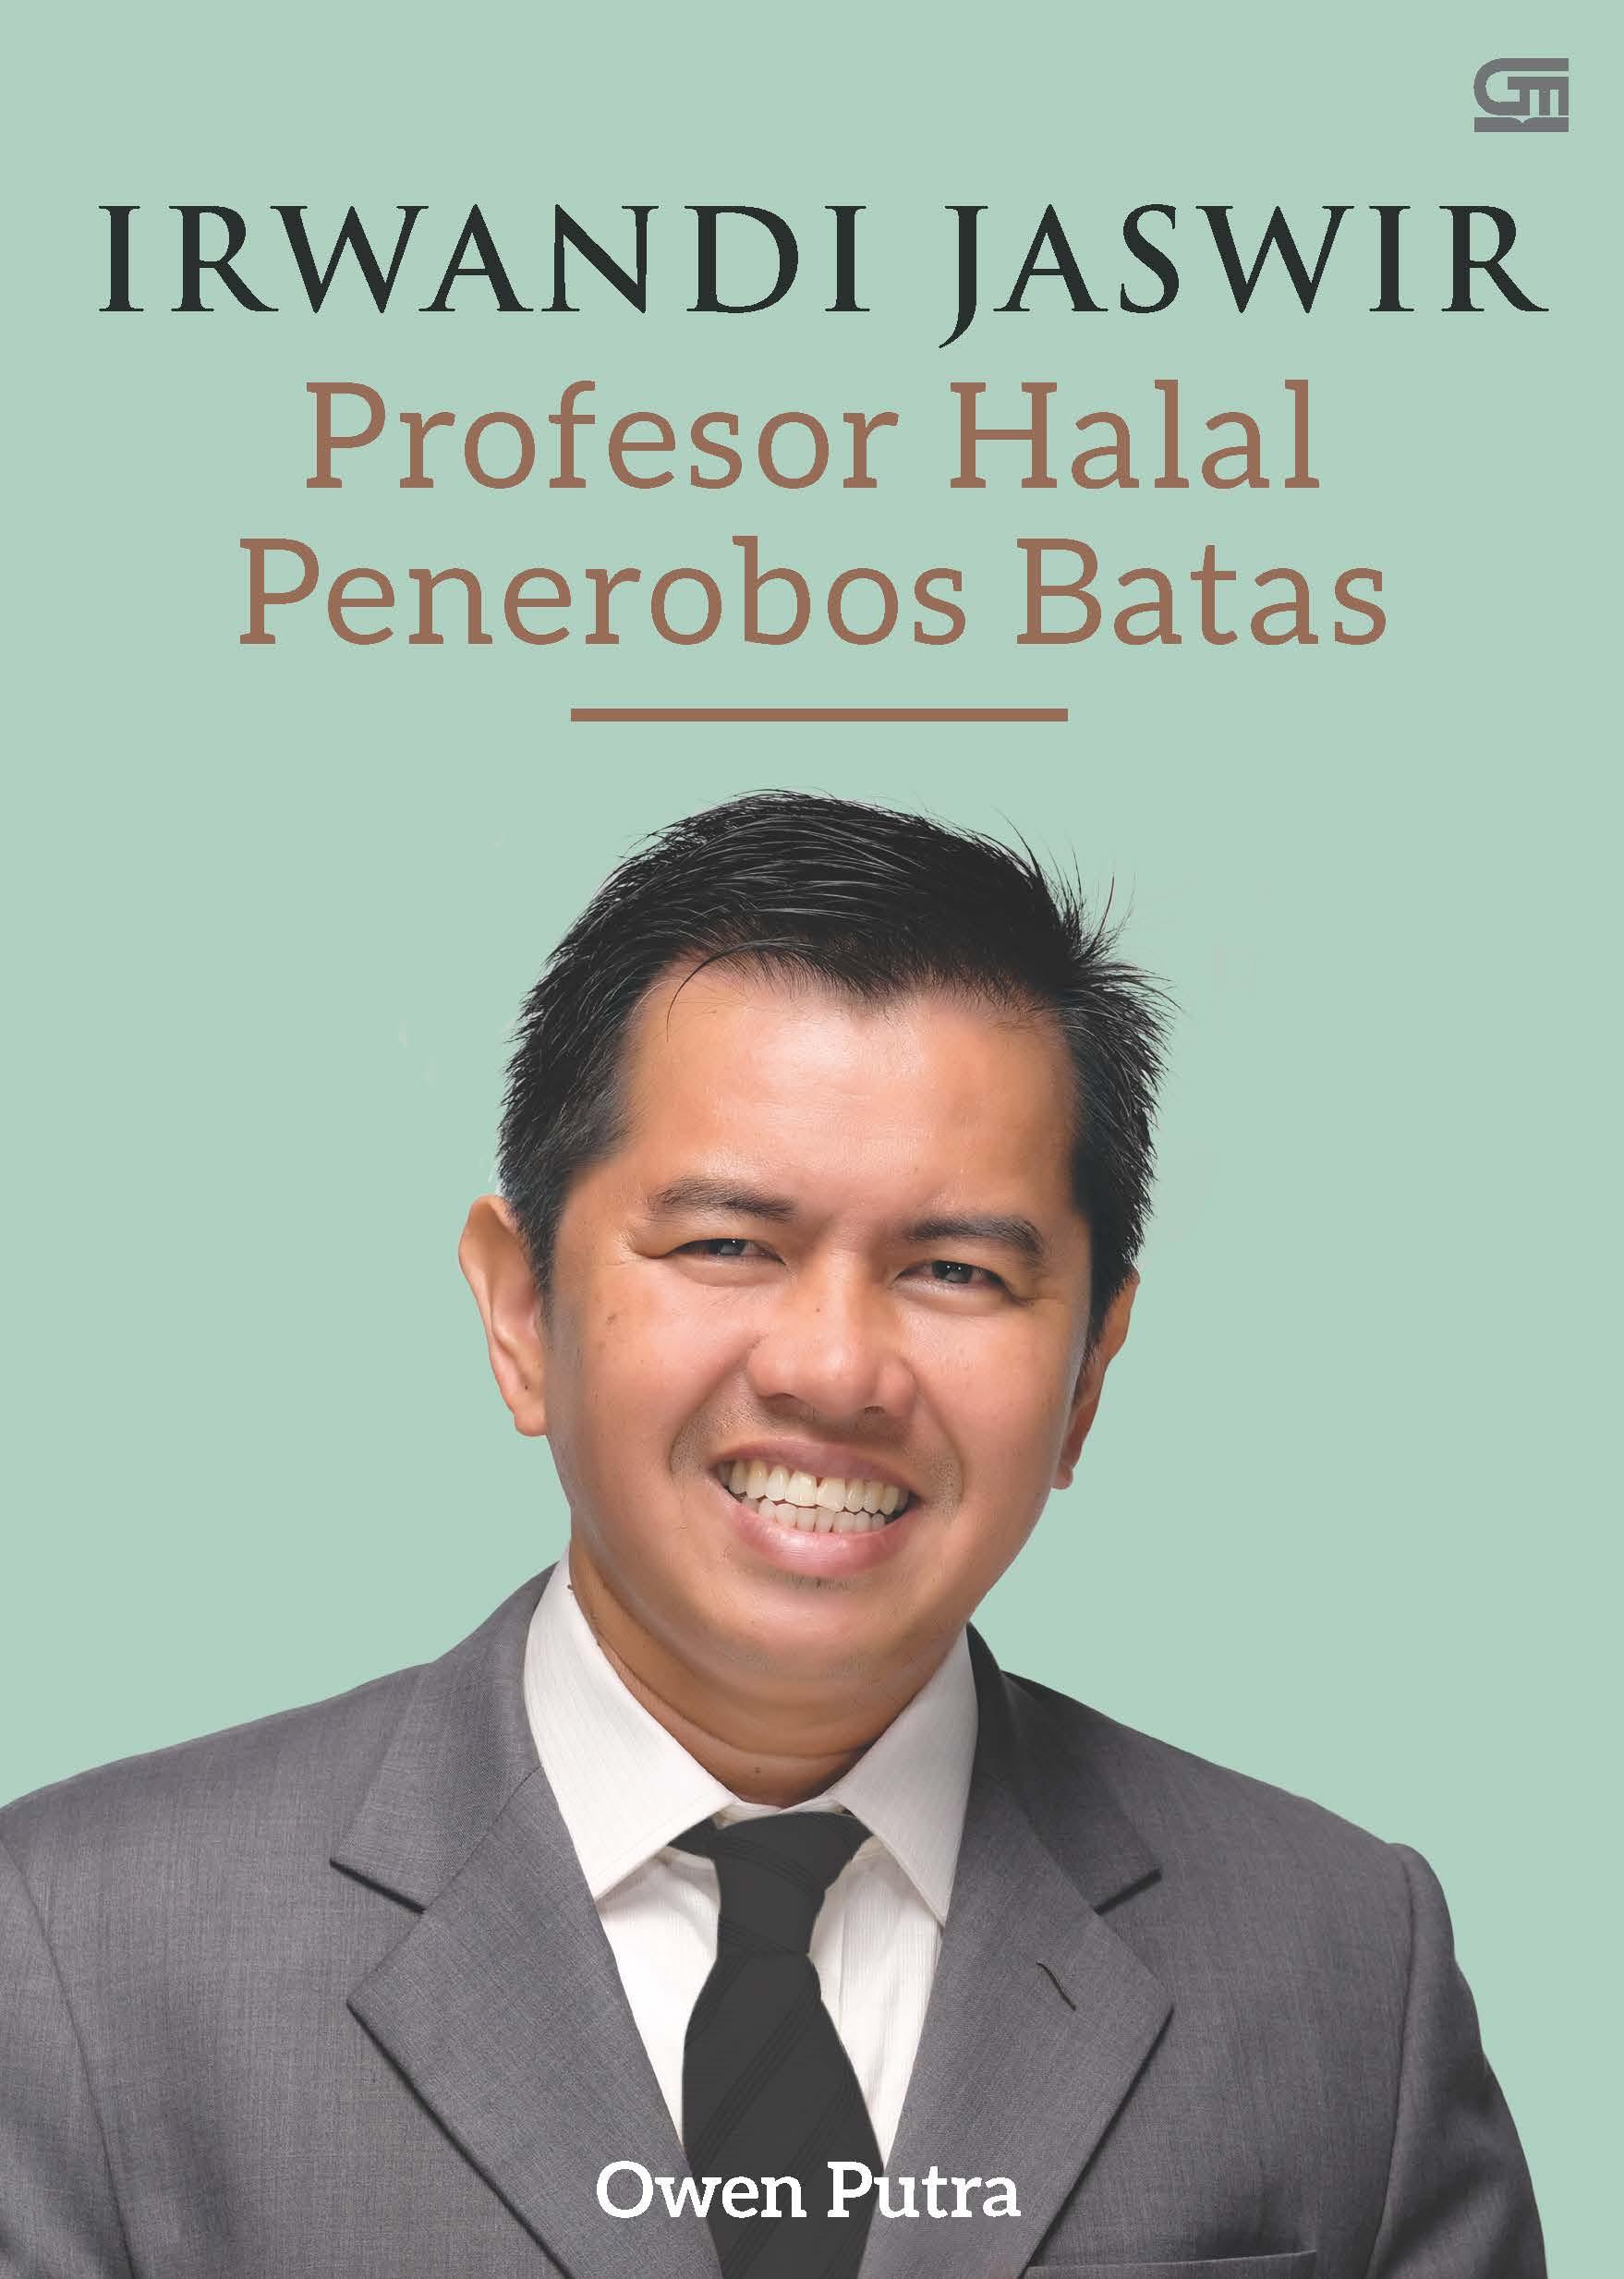 Irwandi Jaswir: Profesor Halal Penerobos Batas